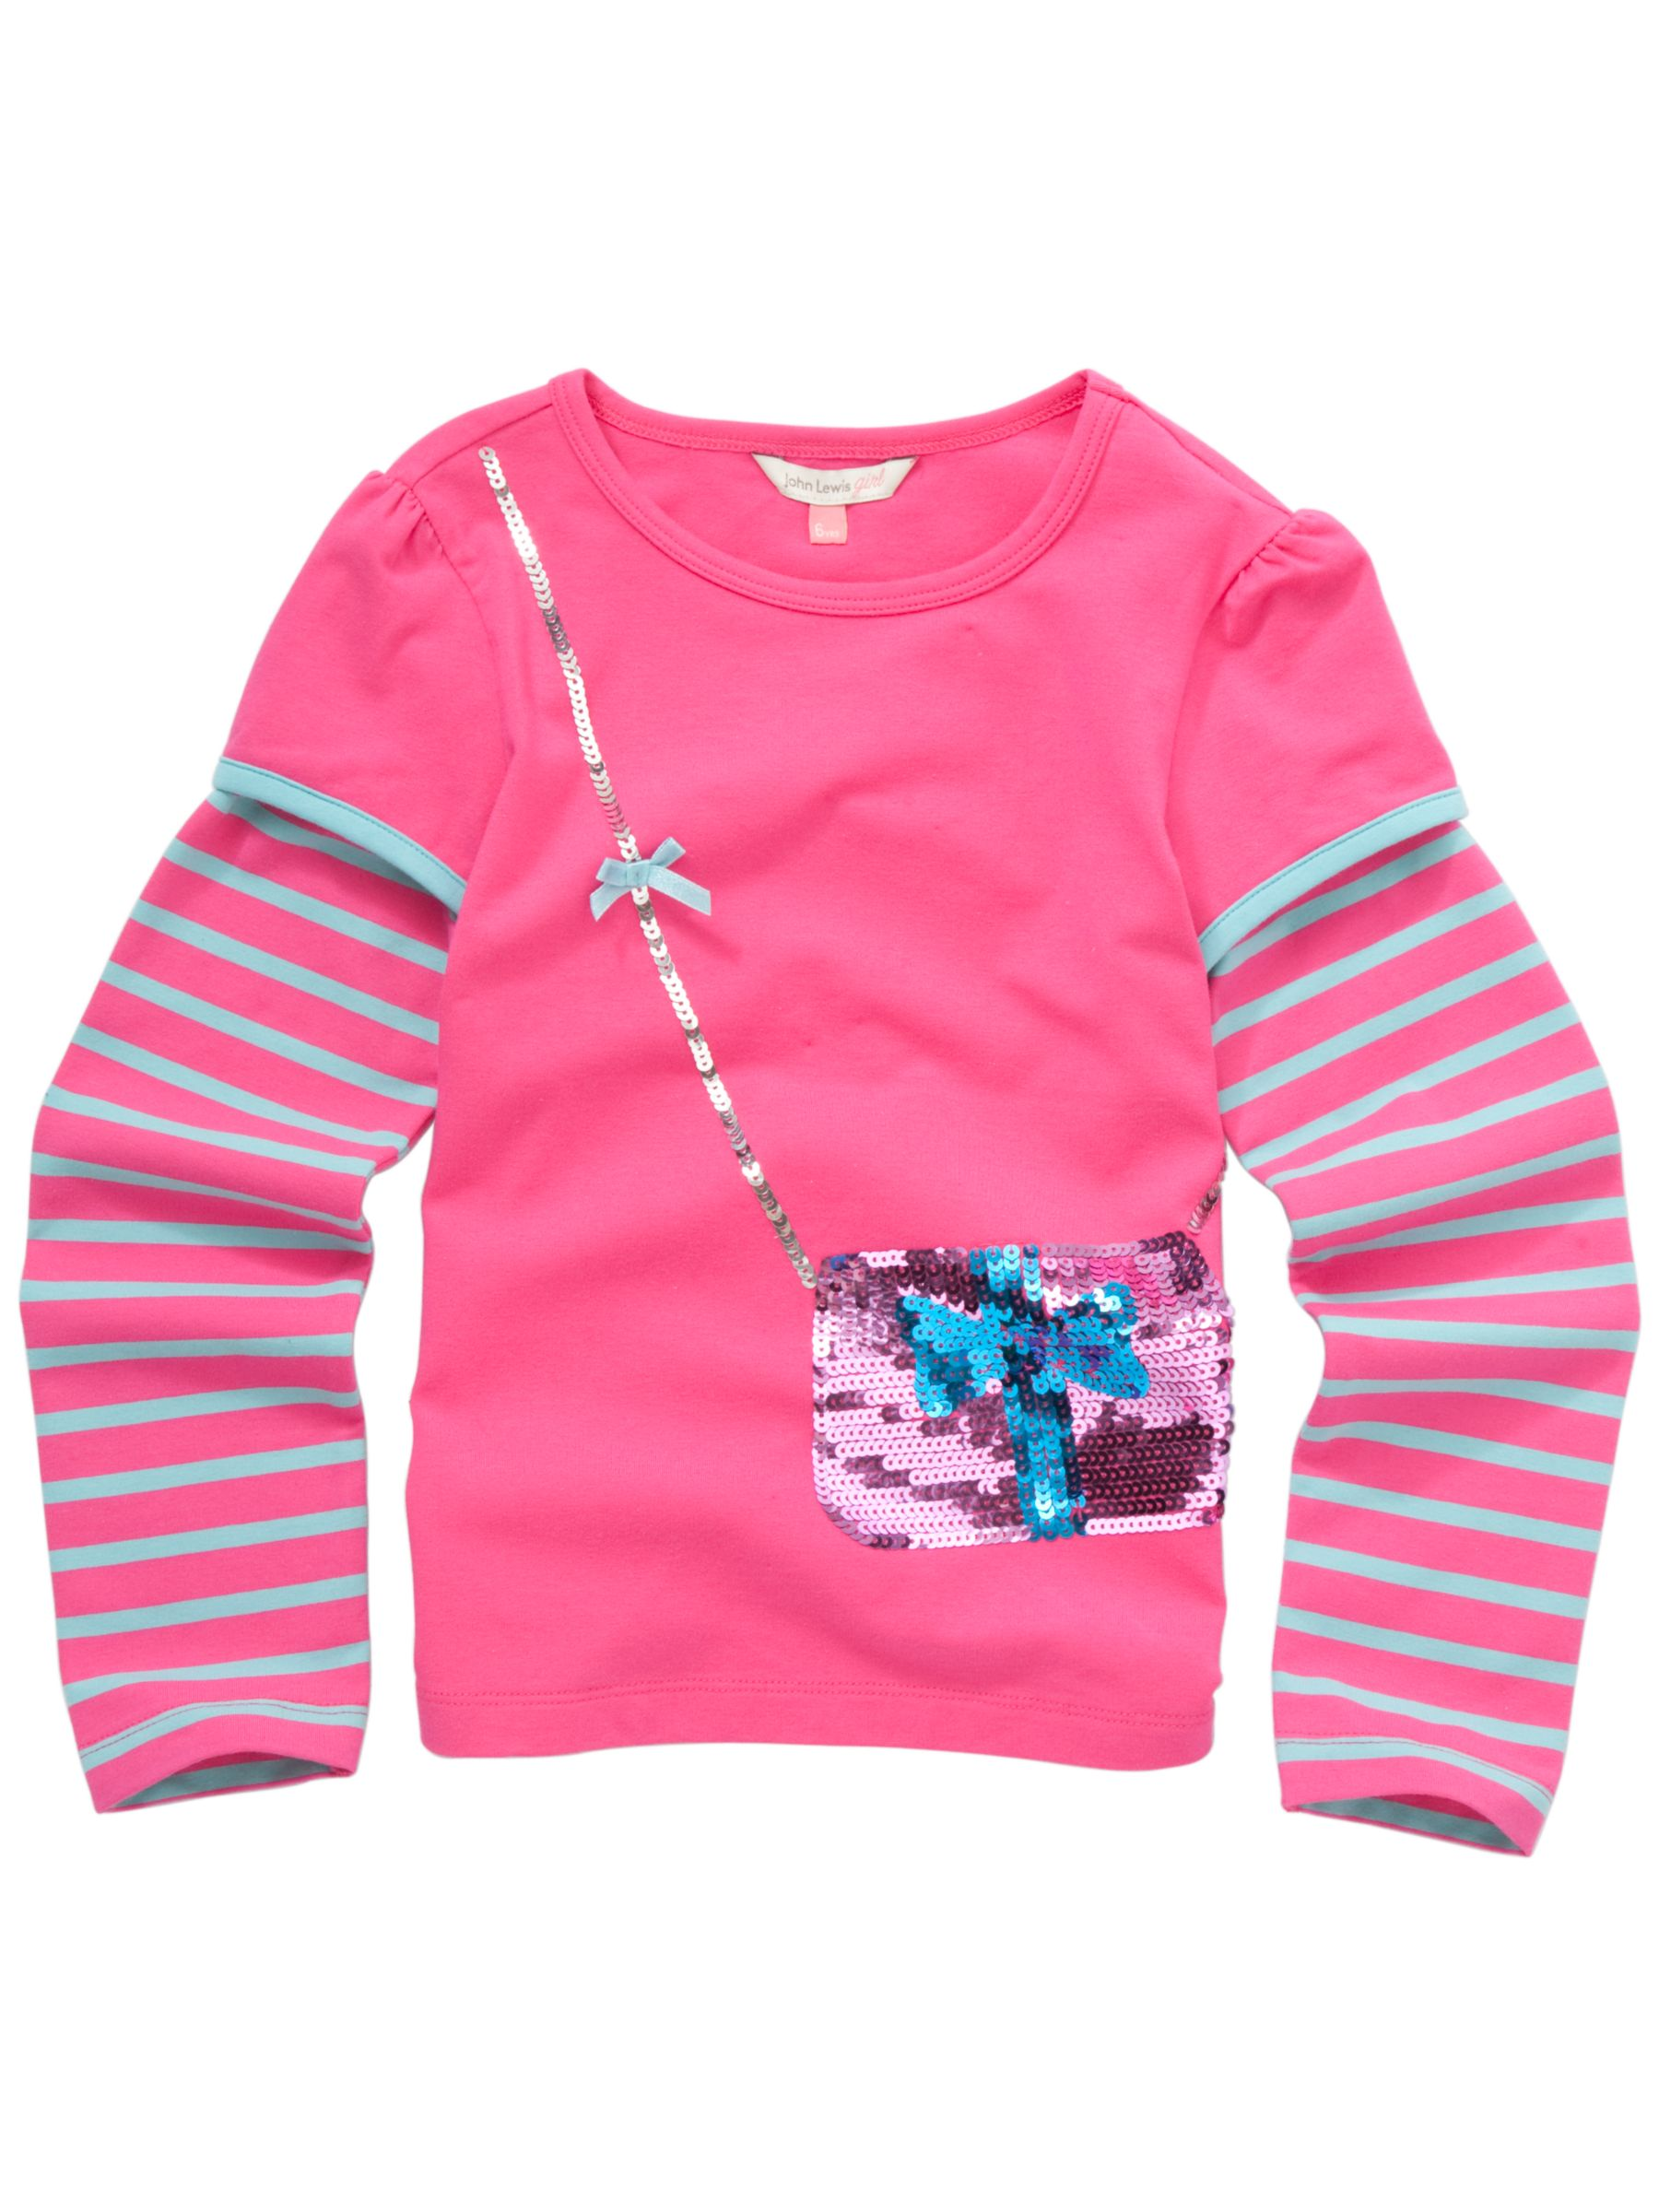 Sequin Handbag T-Shirt, Pink